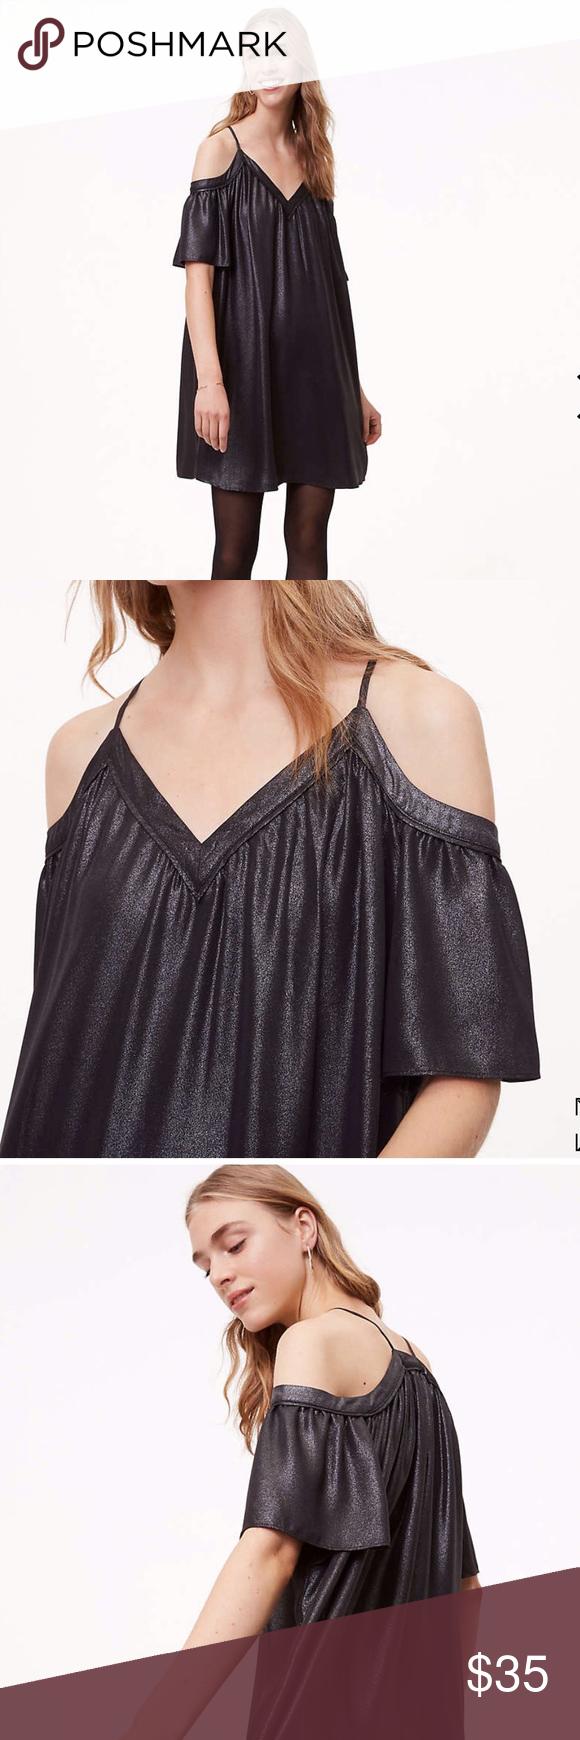 5b135961e69 LOFT Black Shimmer Dress Cold-shoulder LBD for any occasion — causal or  fancy!